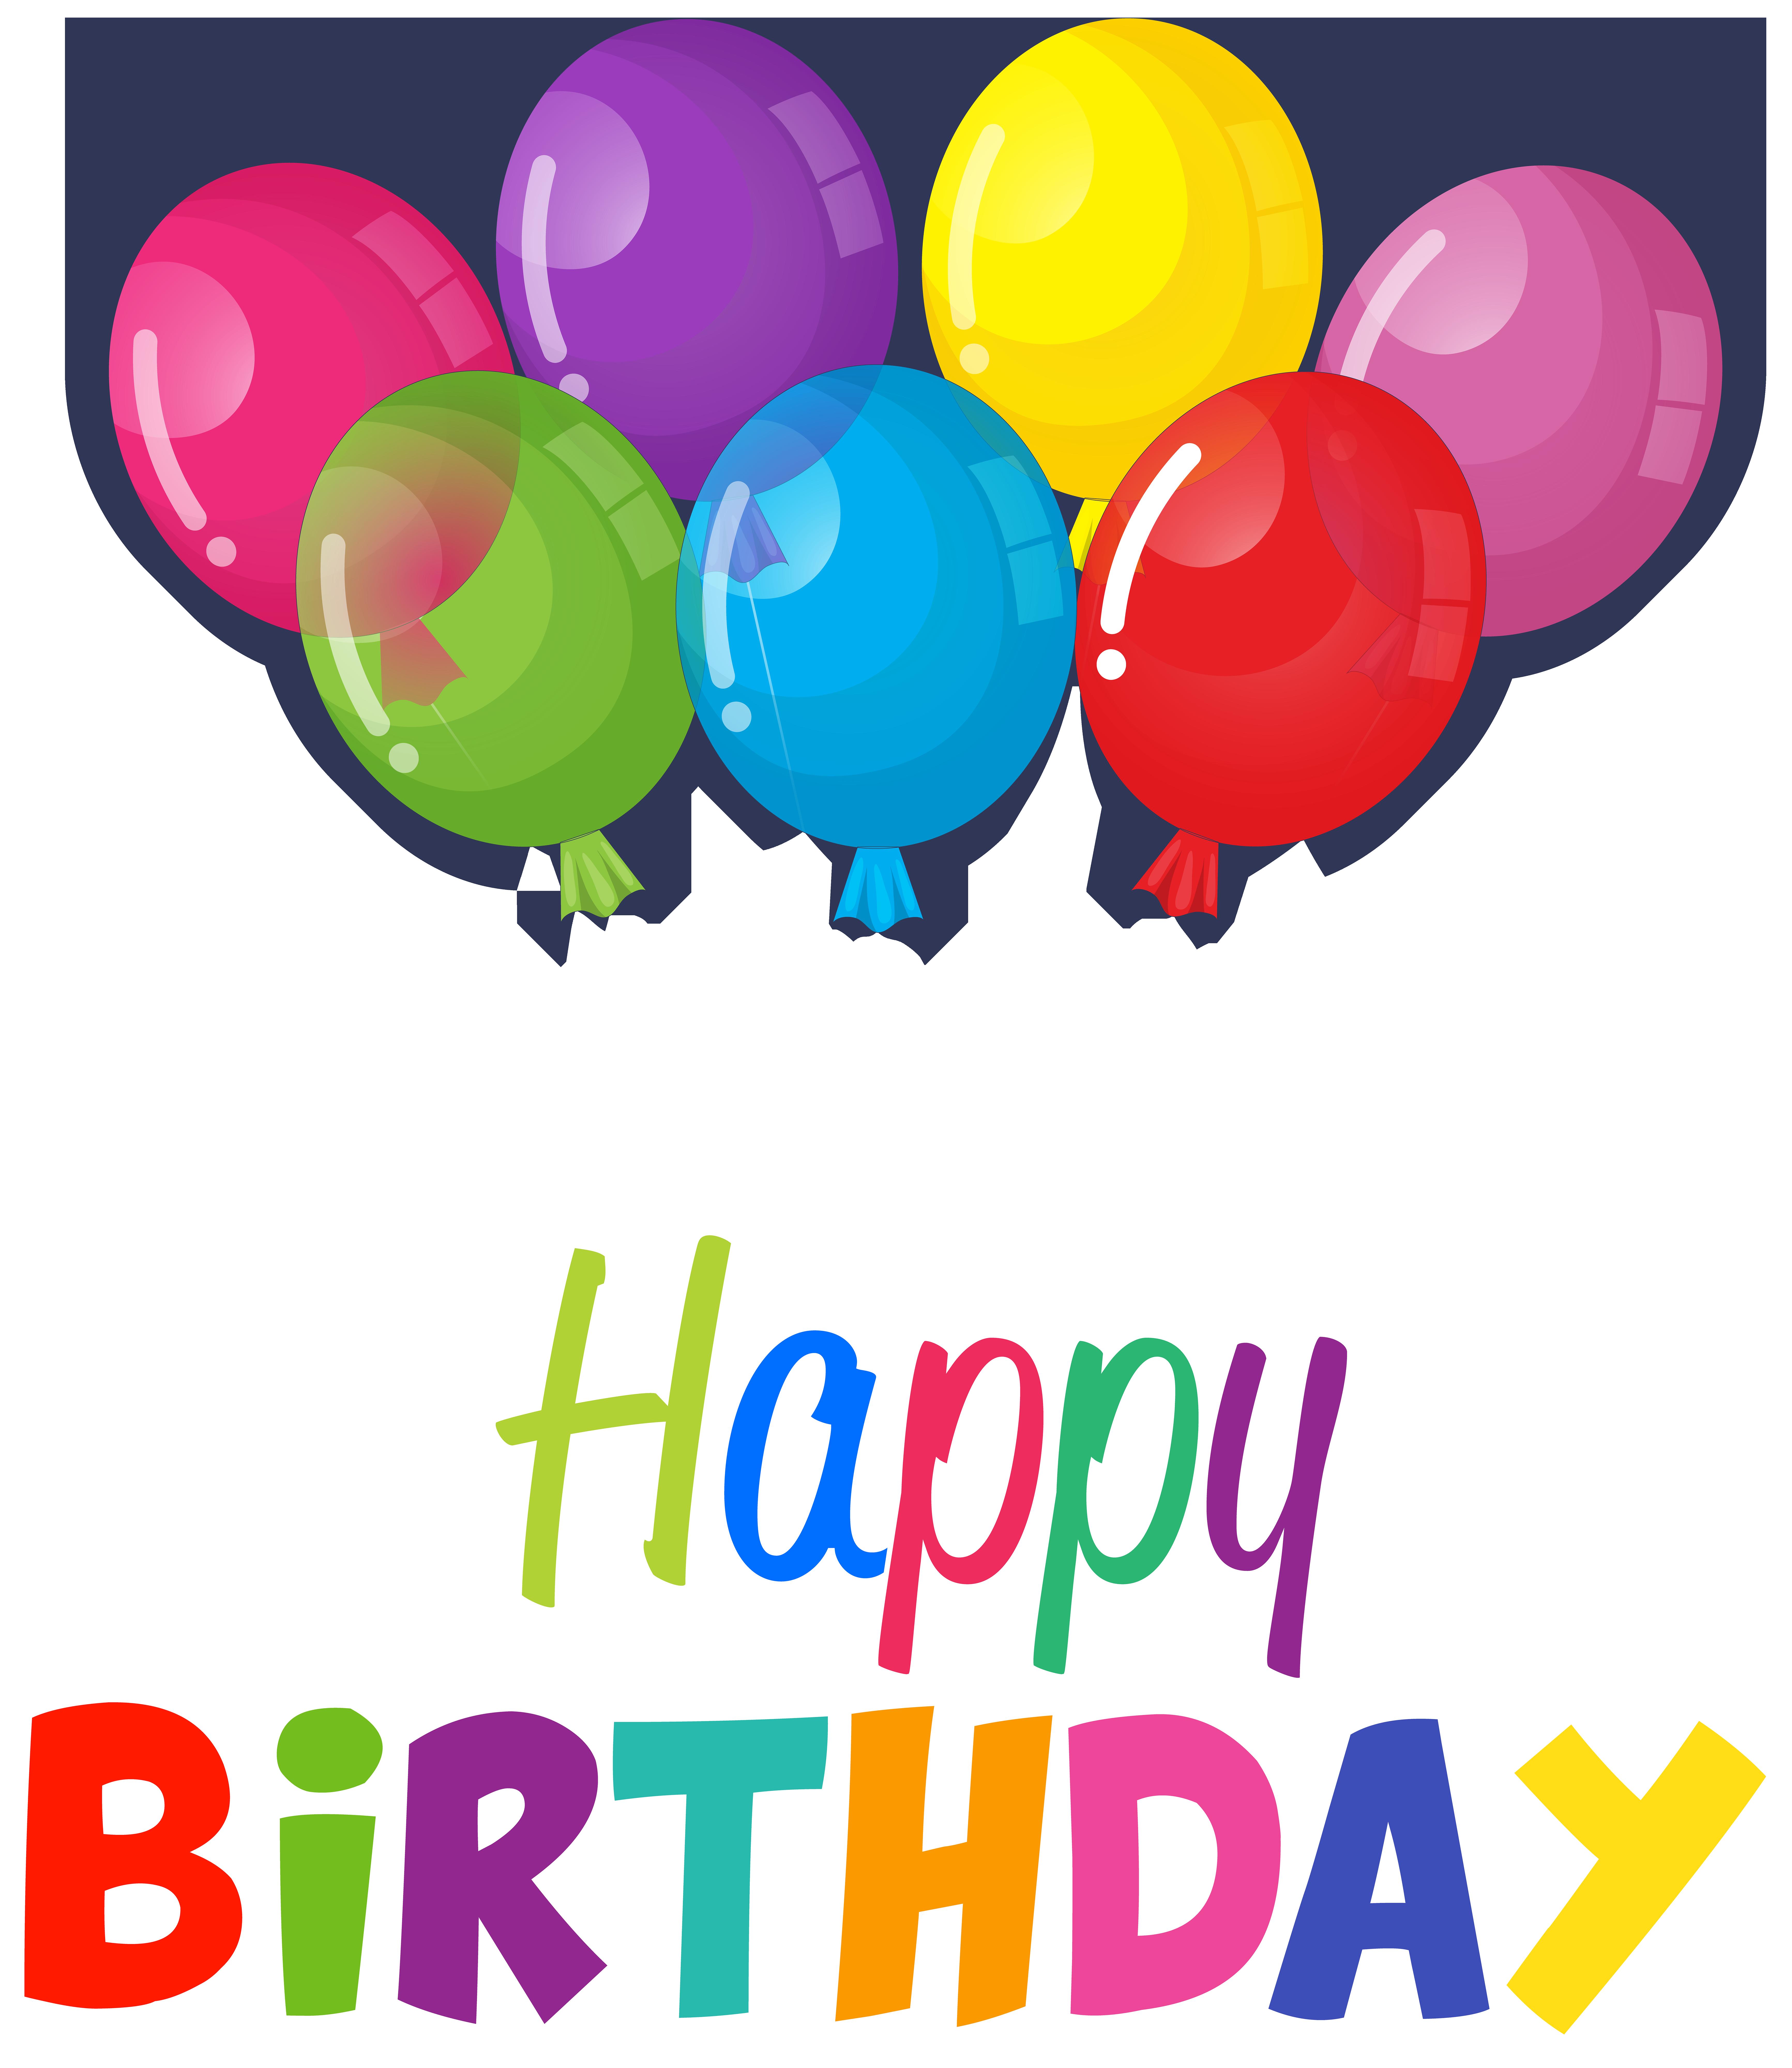 Happy Birthday Balloons Clip Art PNG Image.